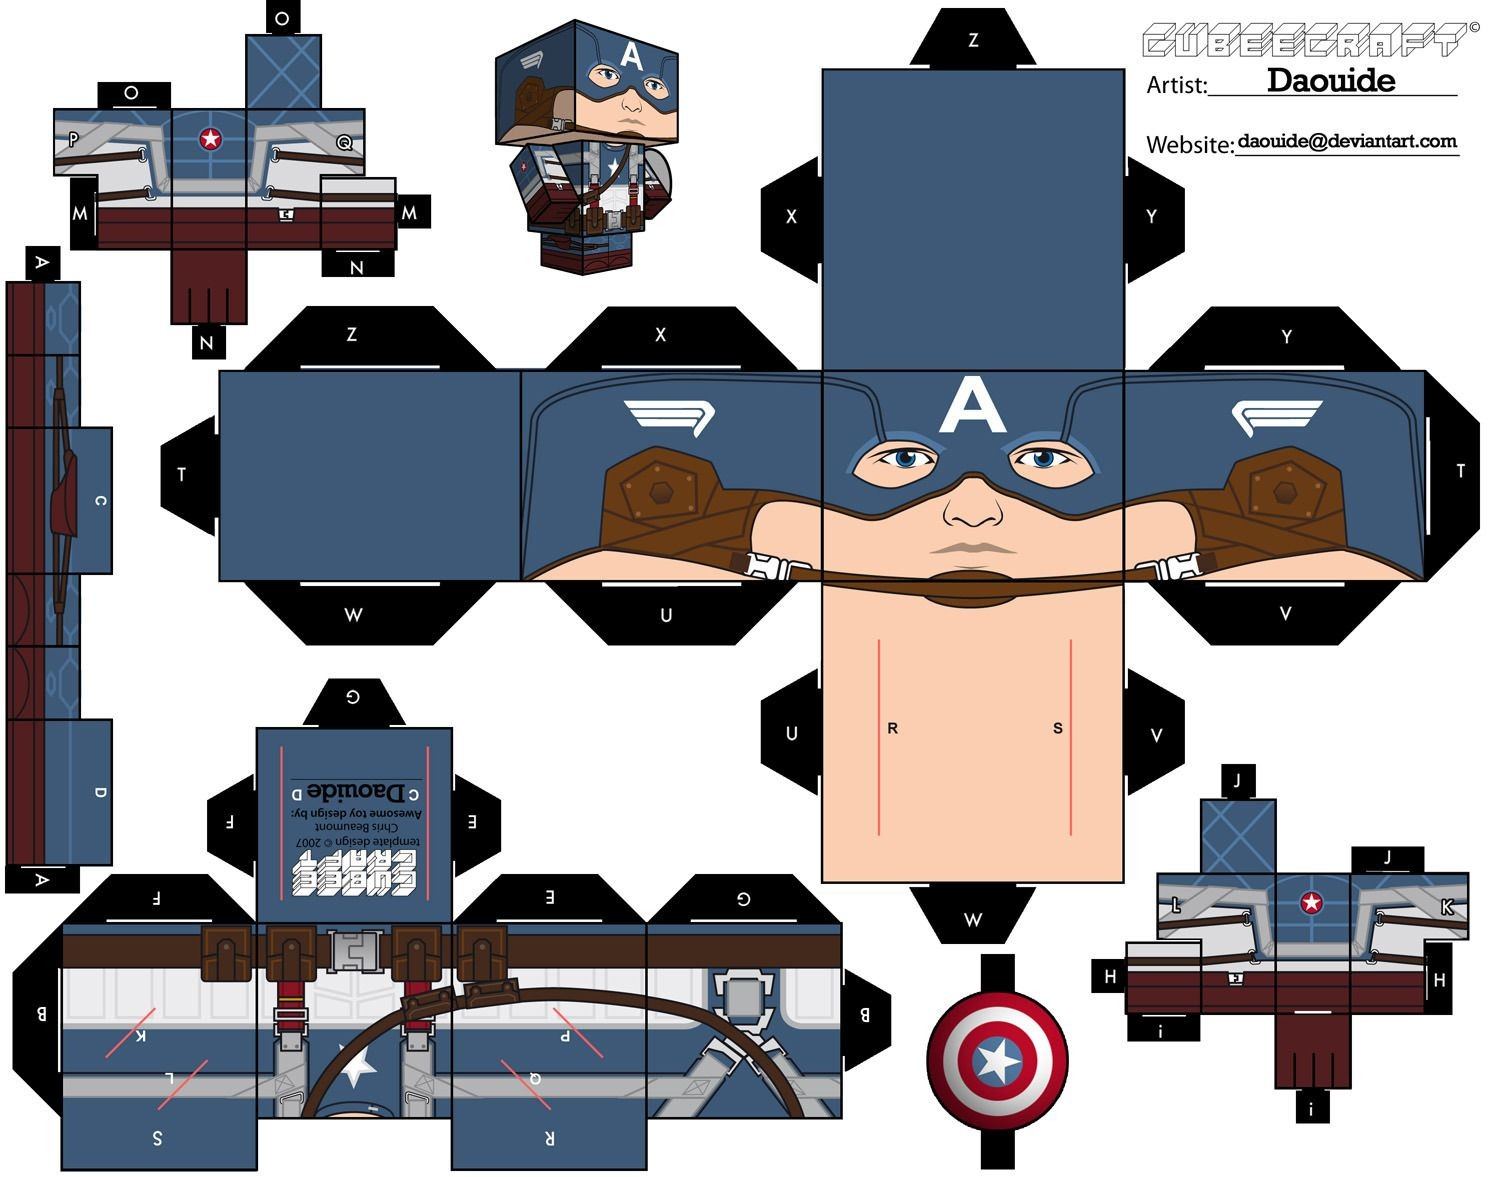 Captain America Papercraft Megapost] Papercraft Tus Personajes Preferidos En Papel